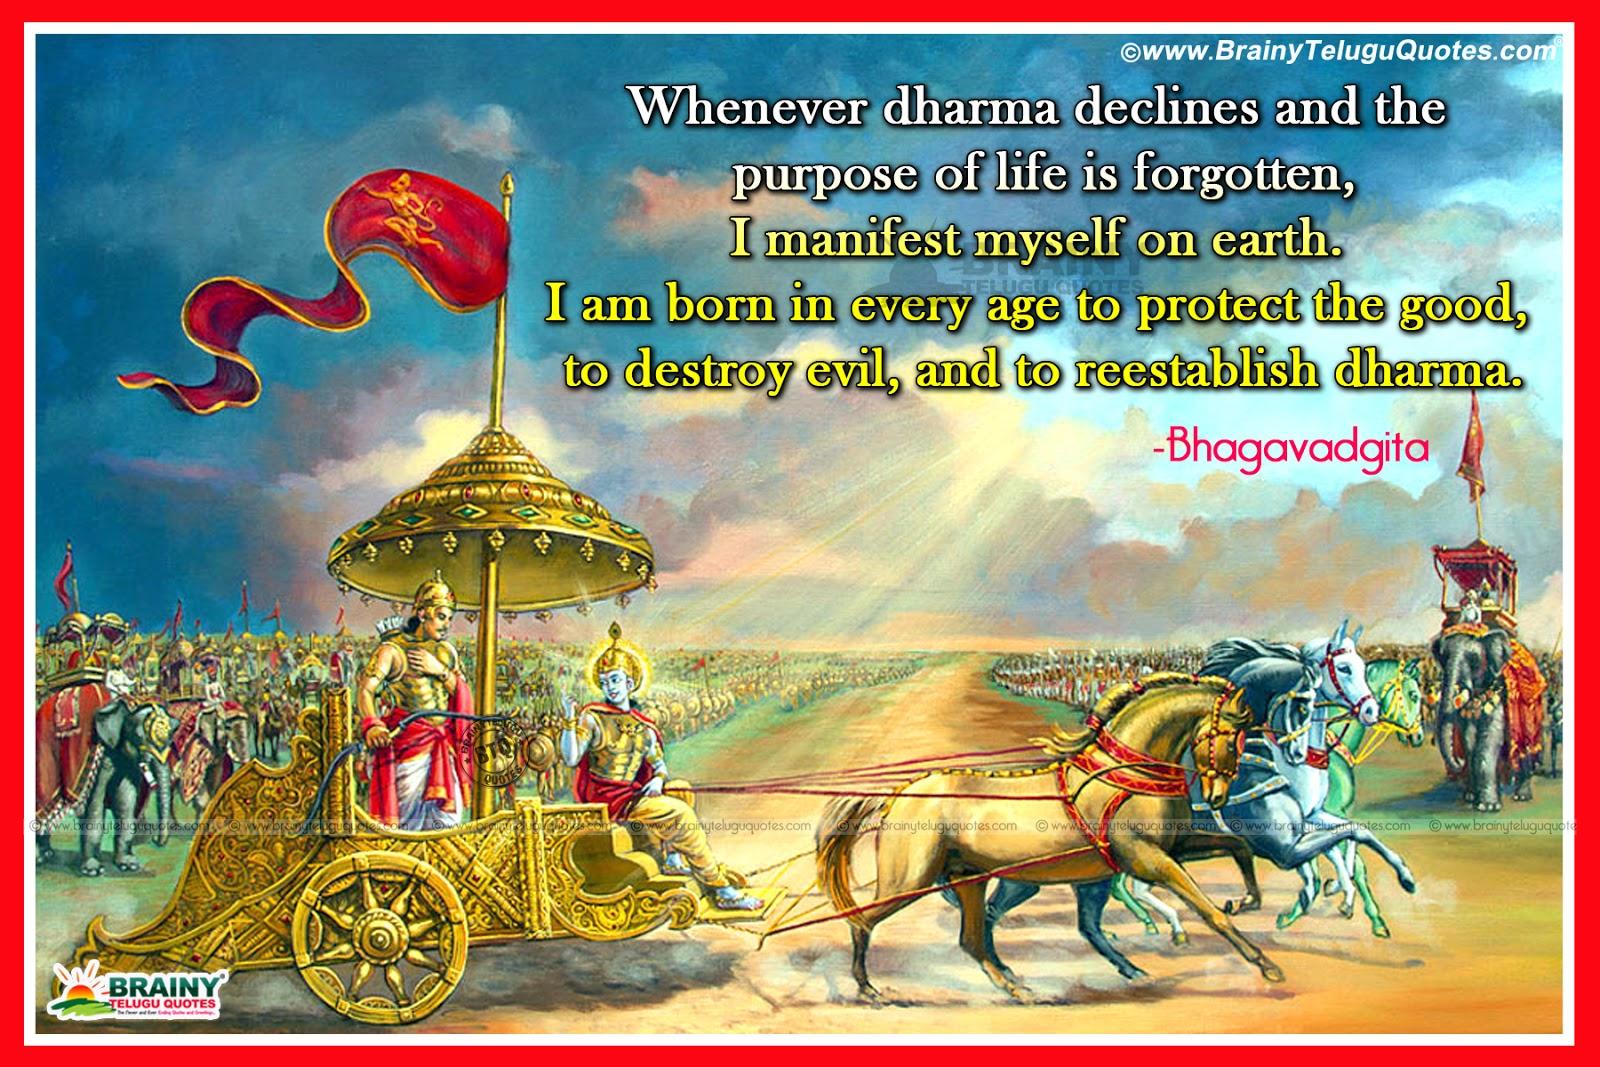 Famous Bhagavad Gita Quotations In English Bhagavad Gita Messages Sms In English